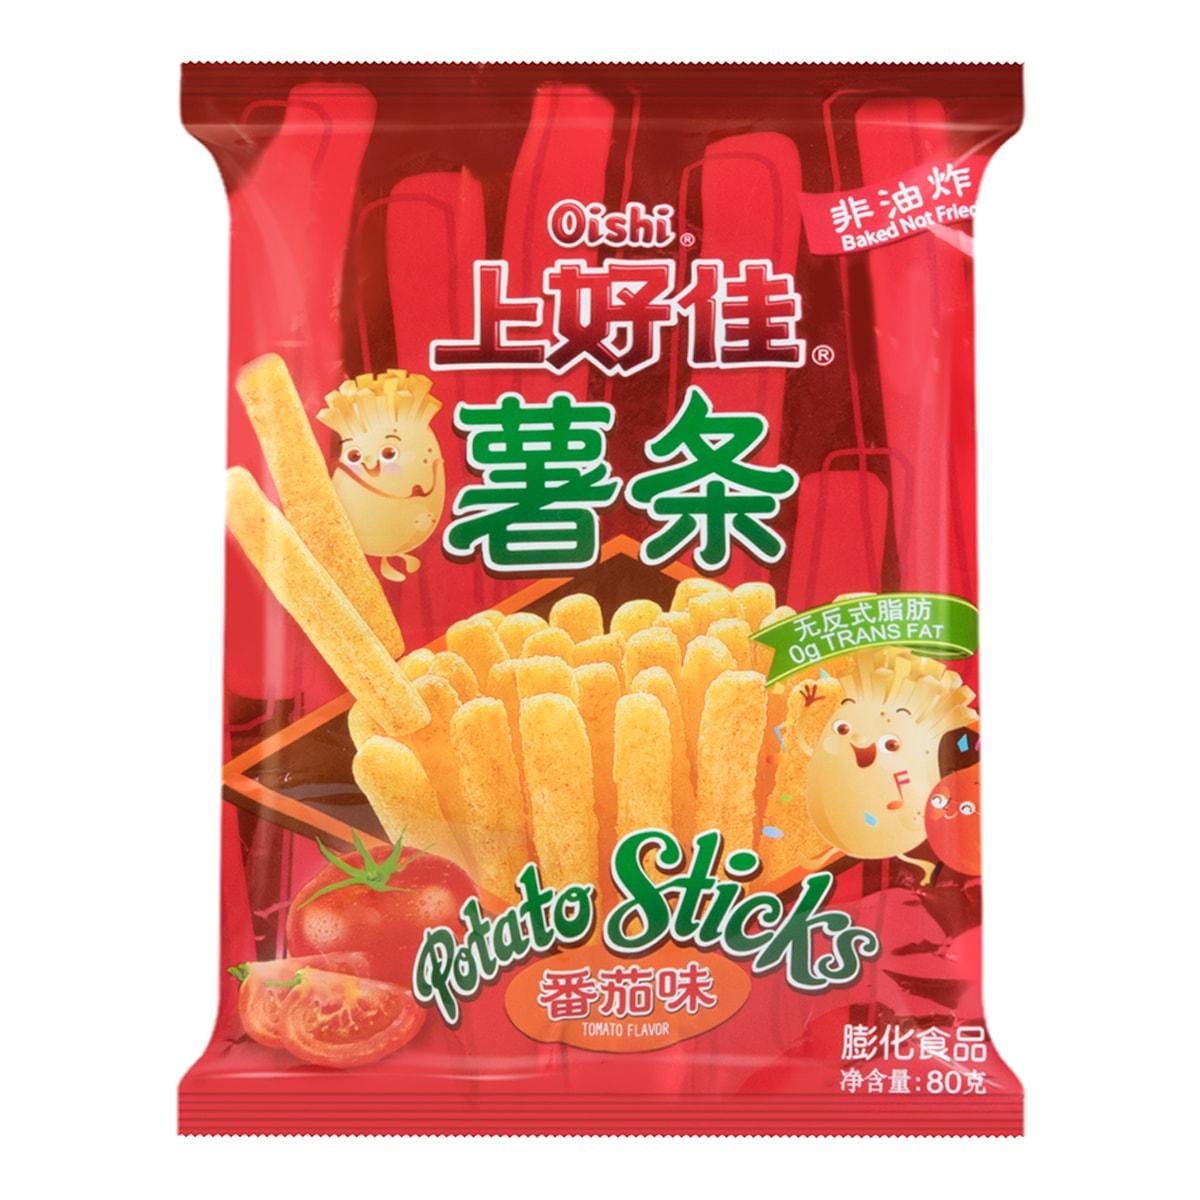 OISHI上好佳 非油炸 番茄味薯条 80g 无反式脂肪